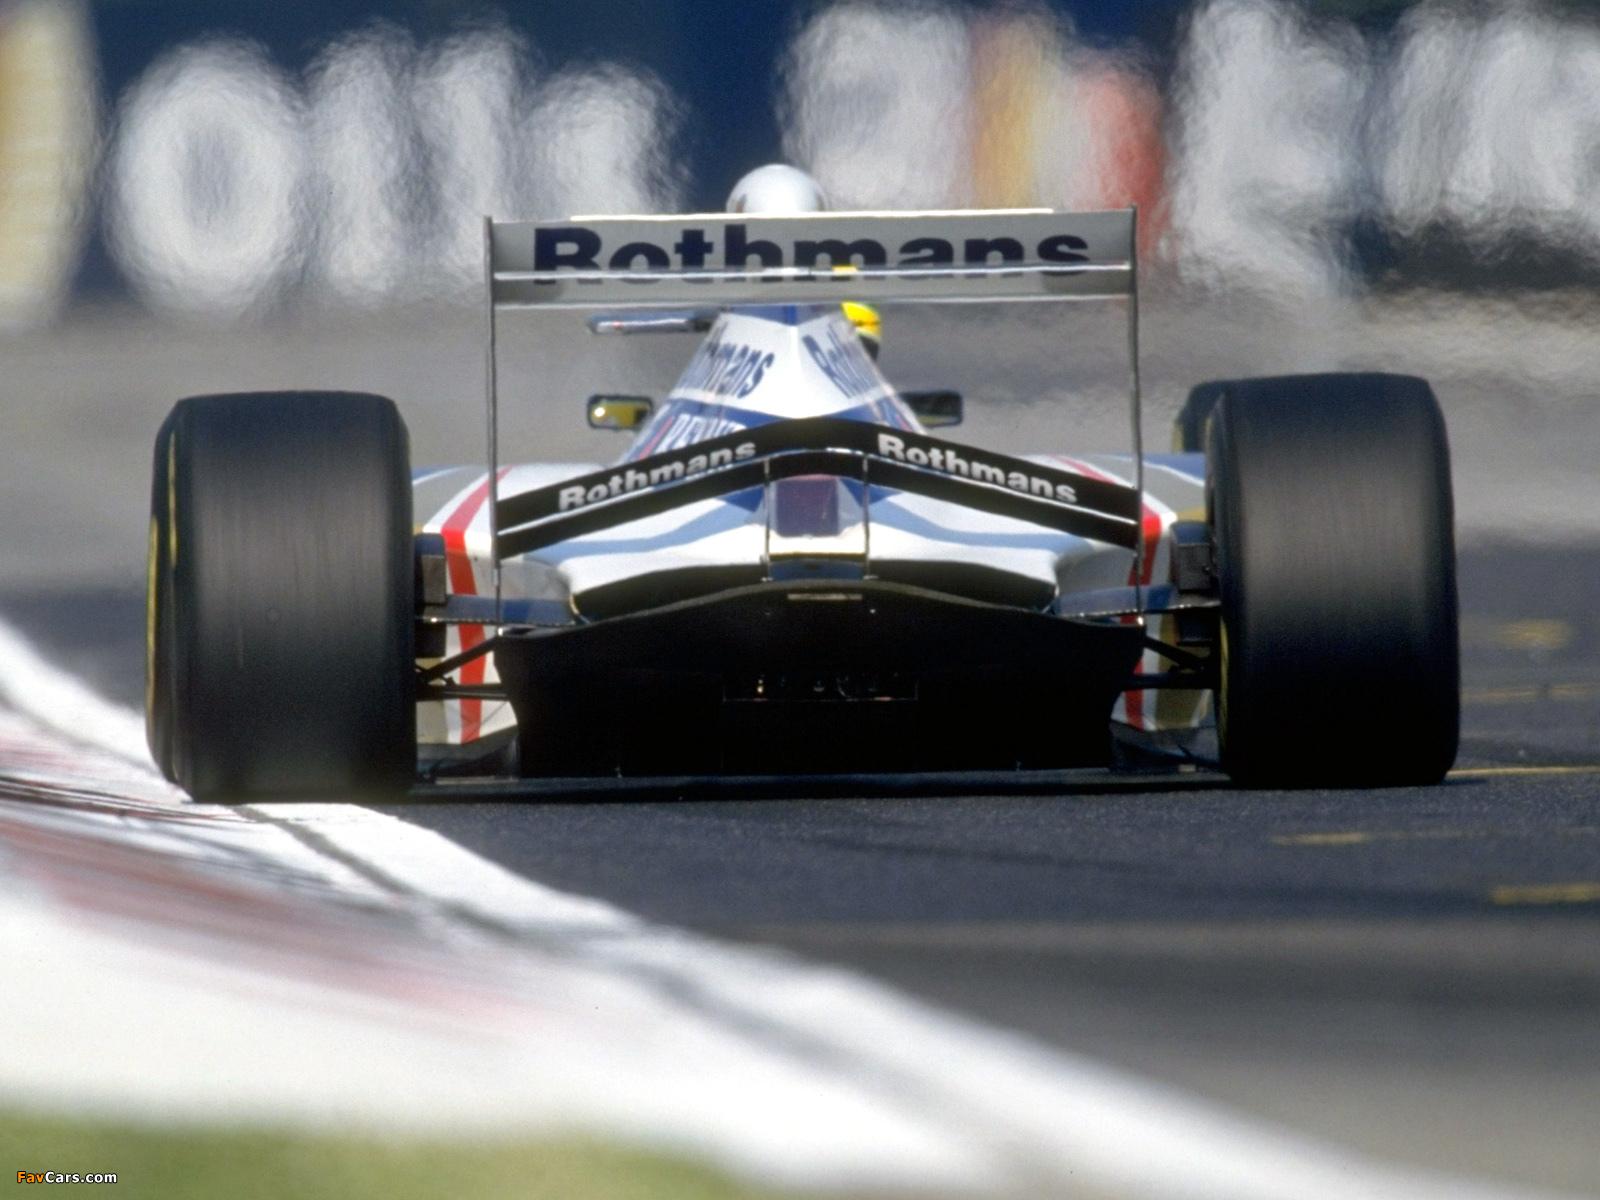 Ayrton Senna Rothmans Car Wallpaper Why The Increase In Rake F1technical Net